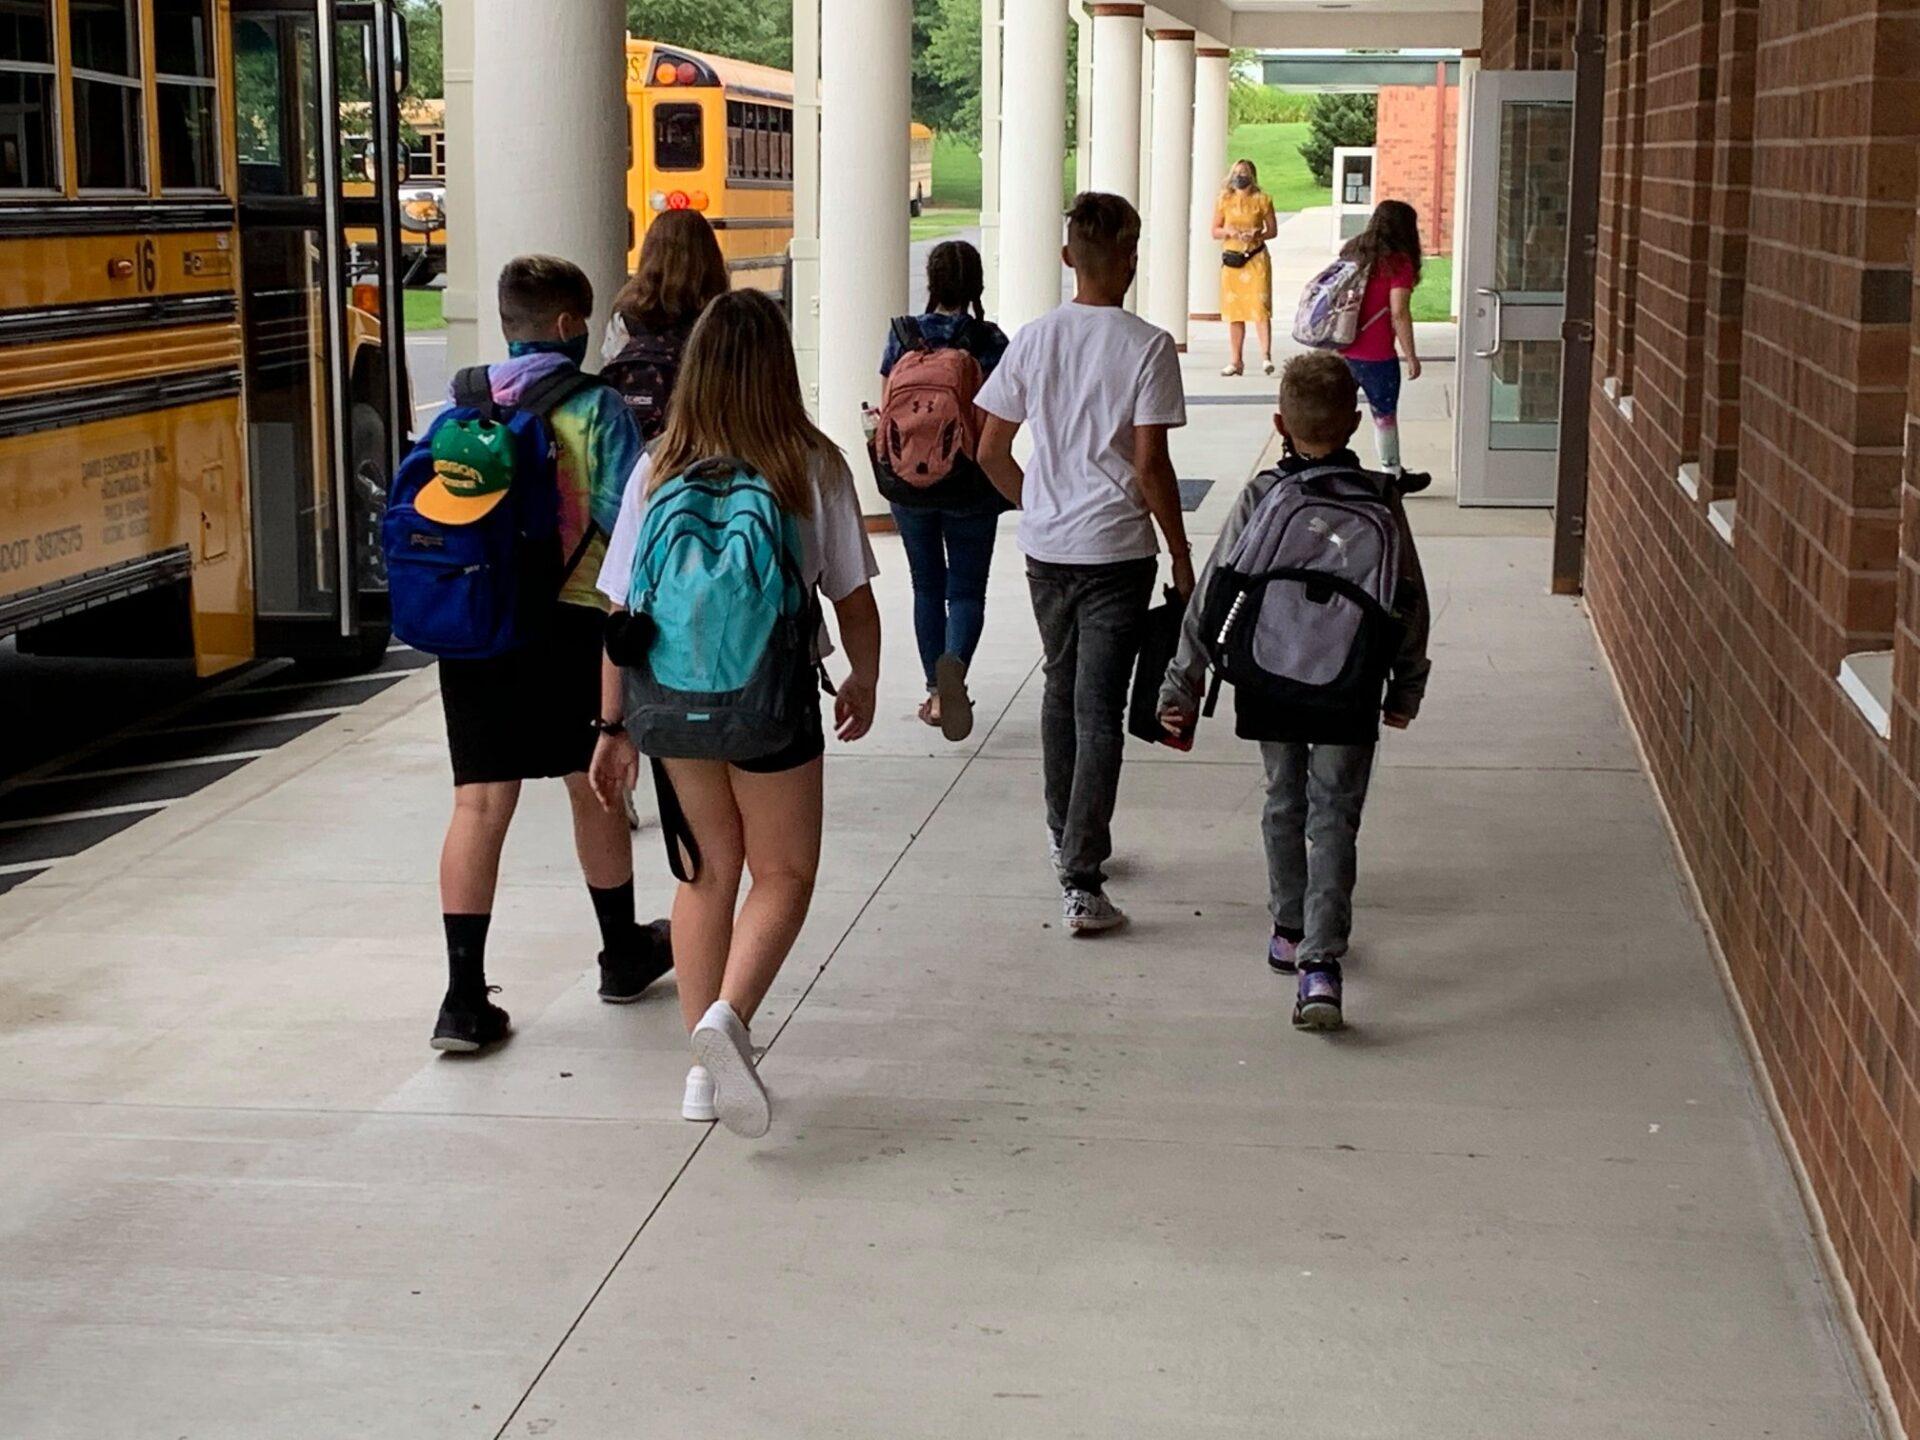 Solanco School District students head into school on Monday, Aug. 31, 2020. (Source: Solanco School District)